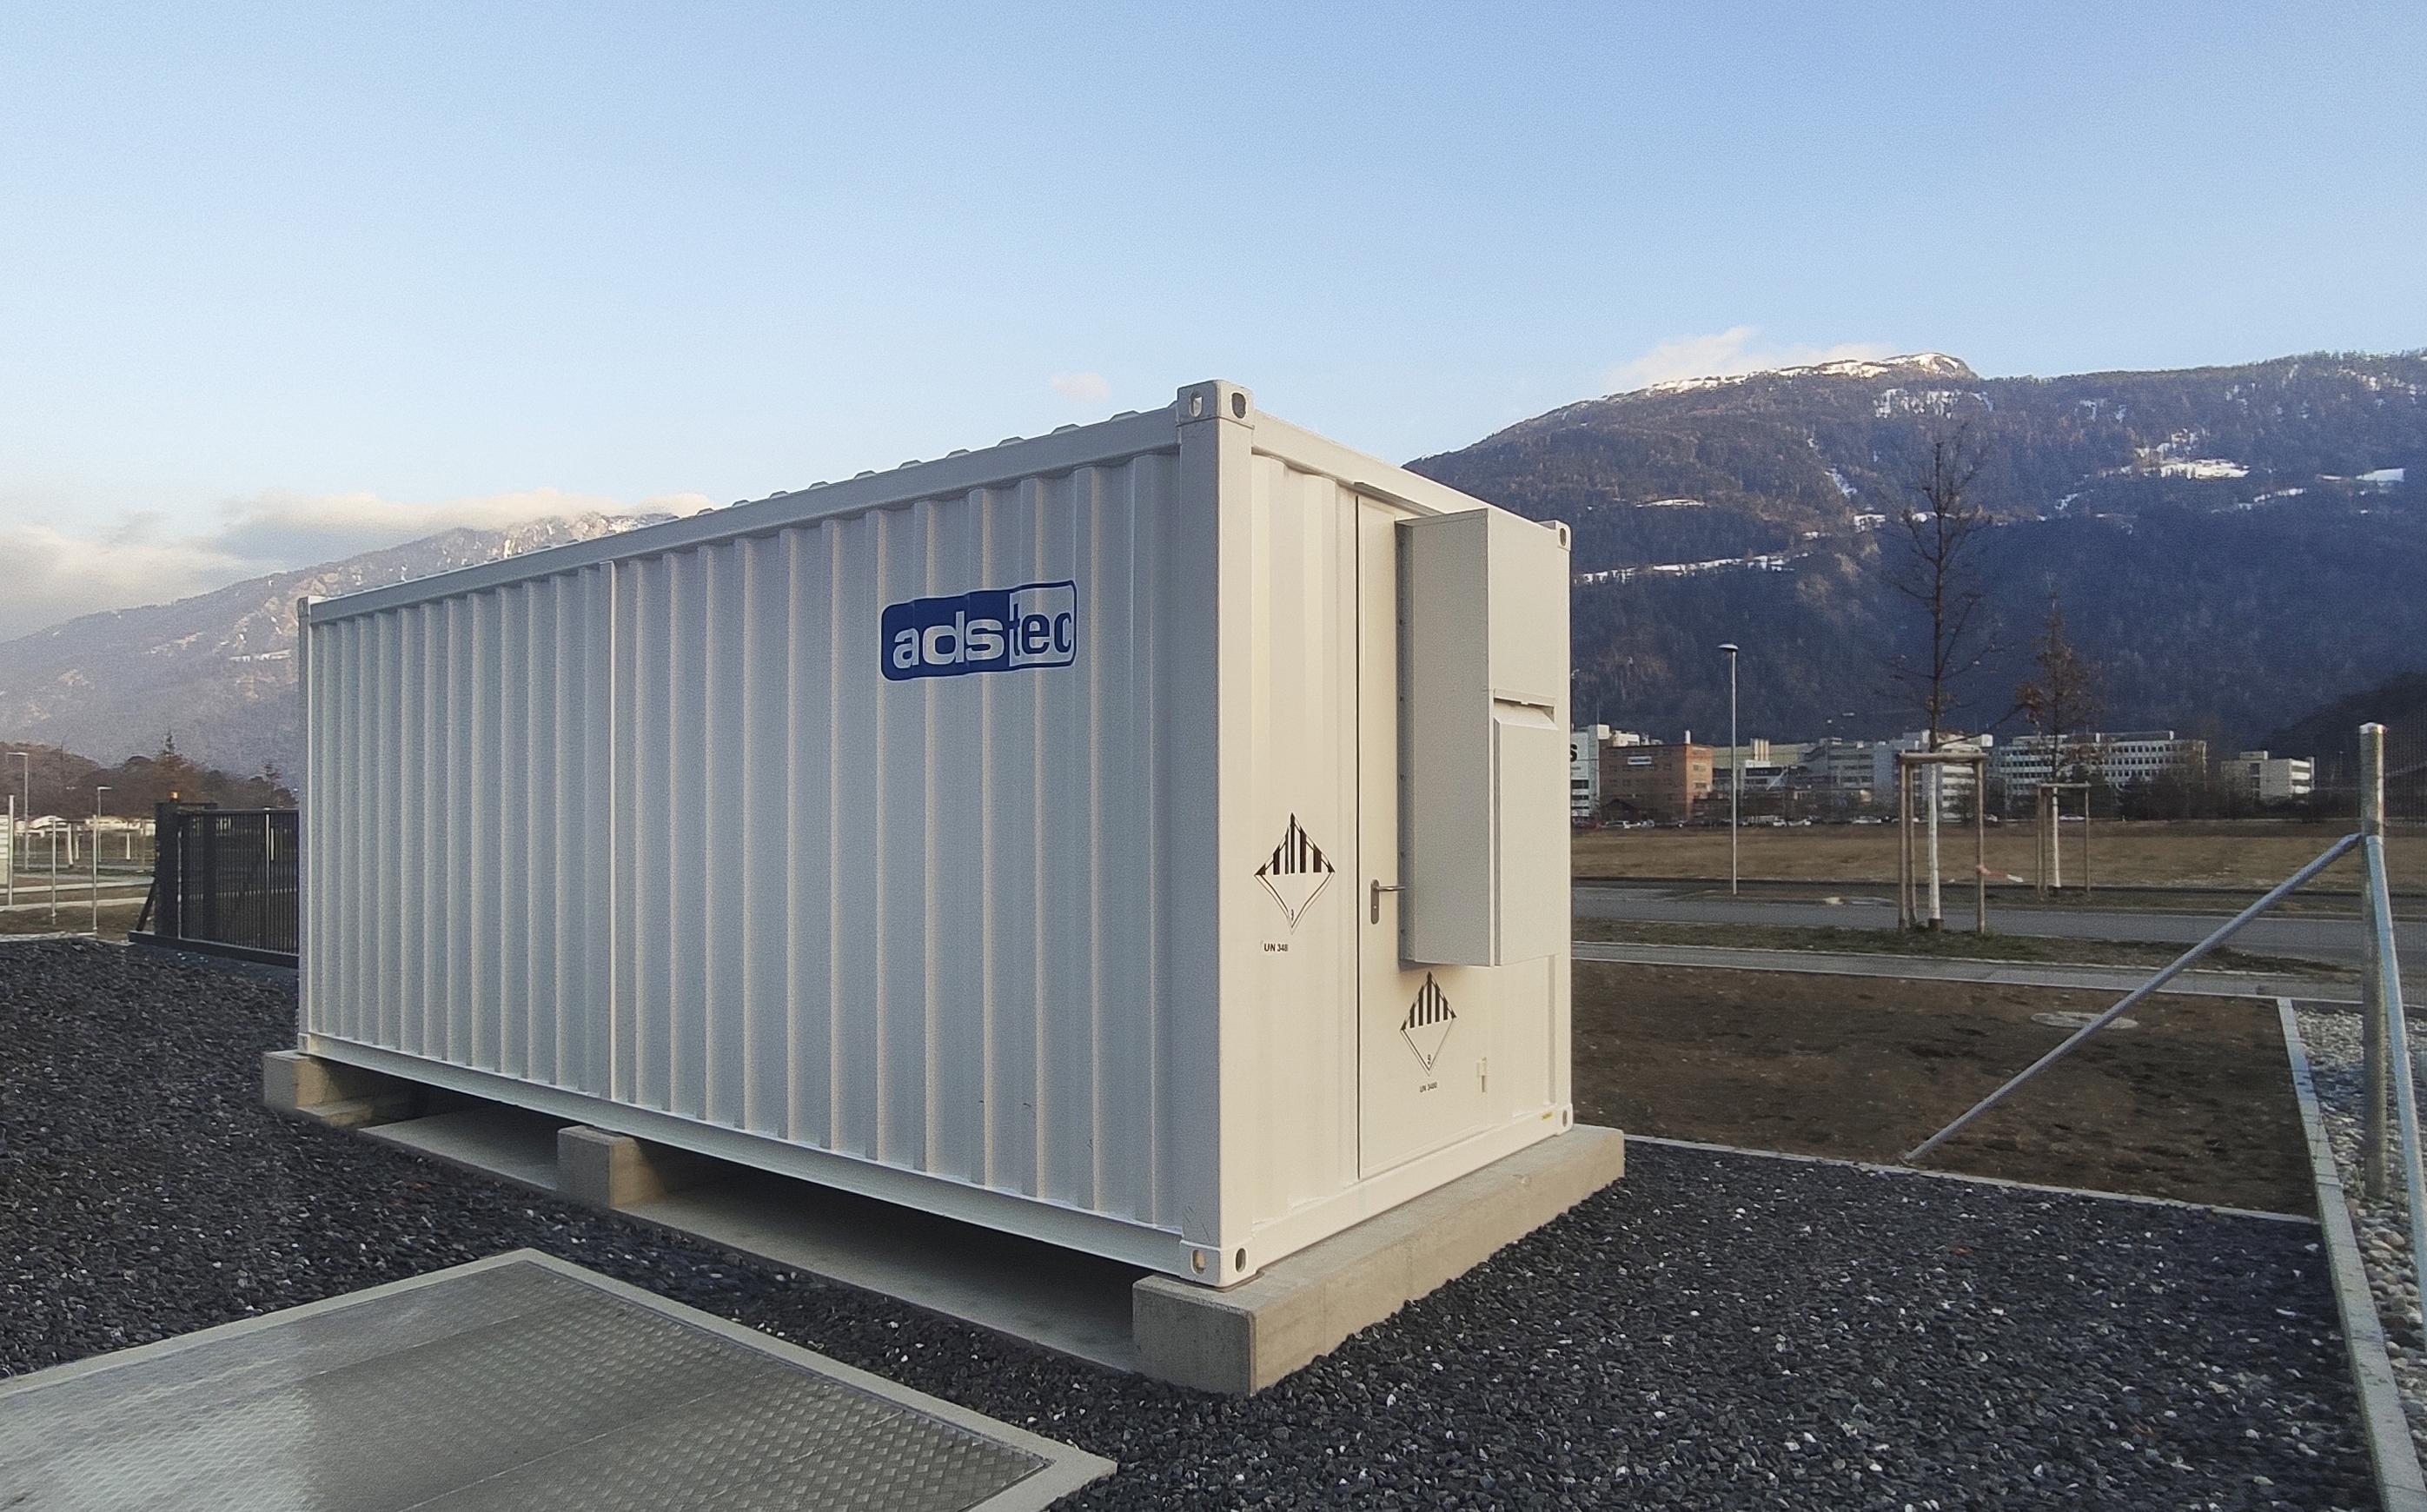 Batterie, Speicher, Container